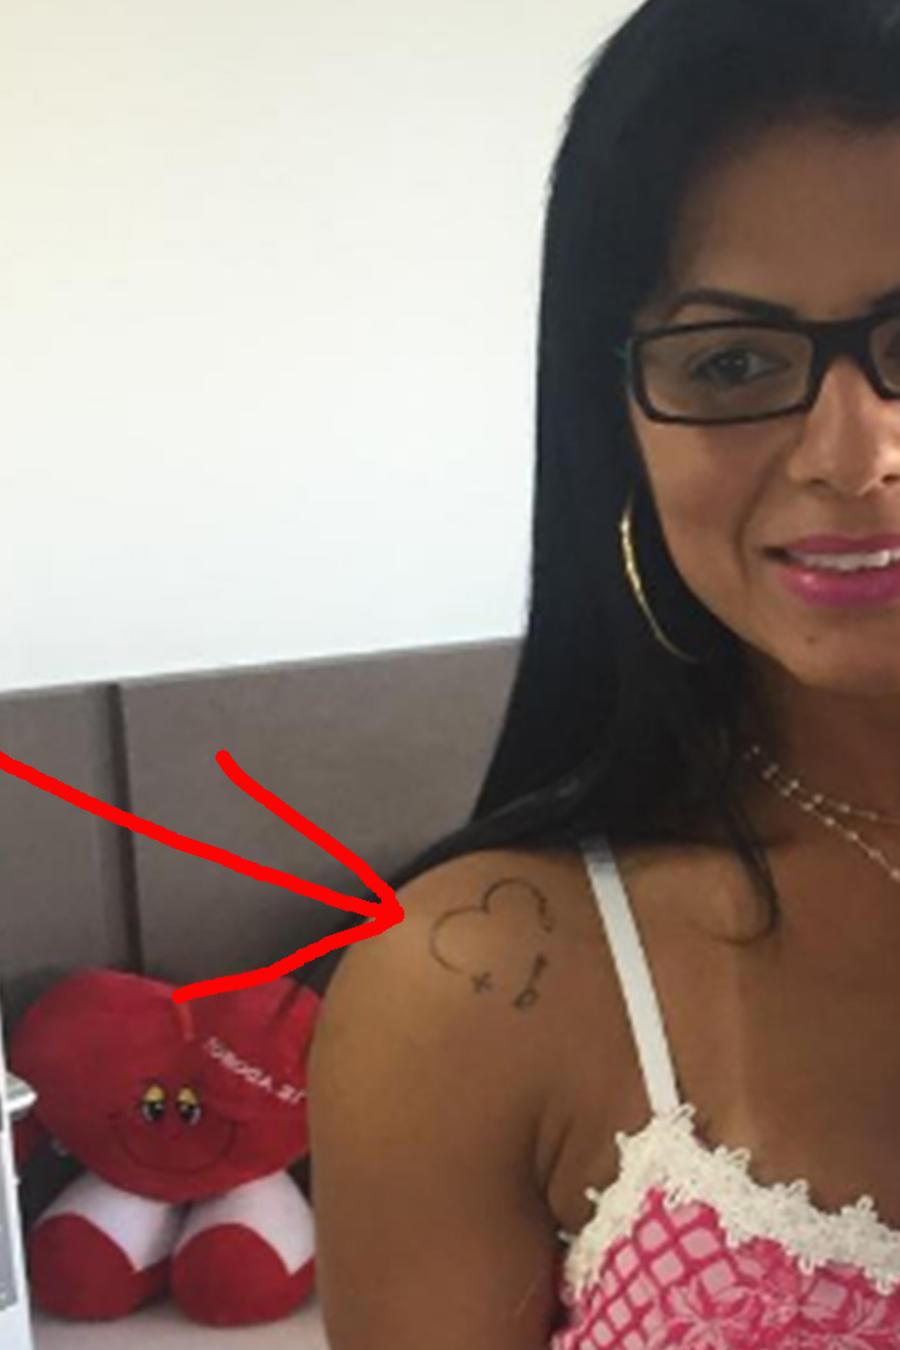 Tatuajes de esposas de Chapecoense parecen premonitorios